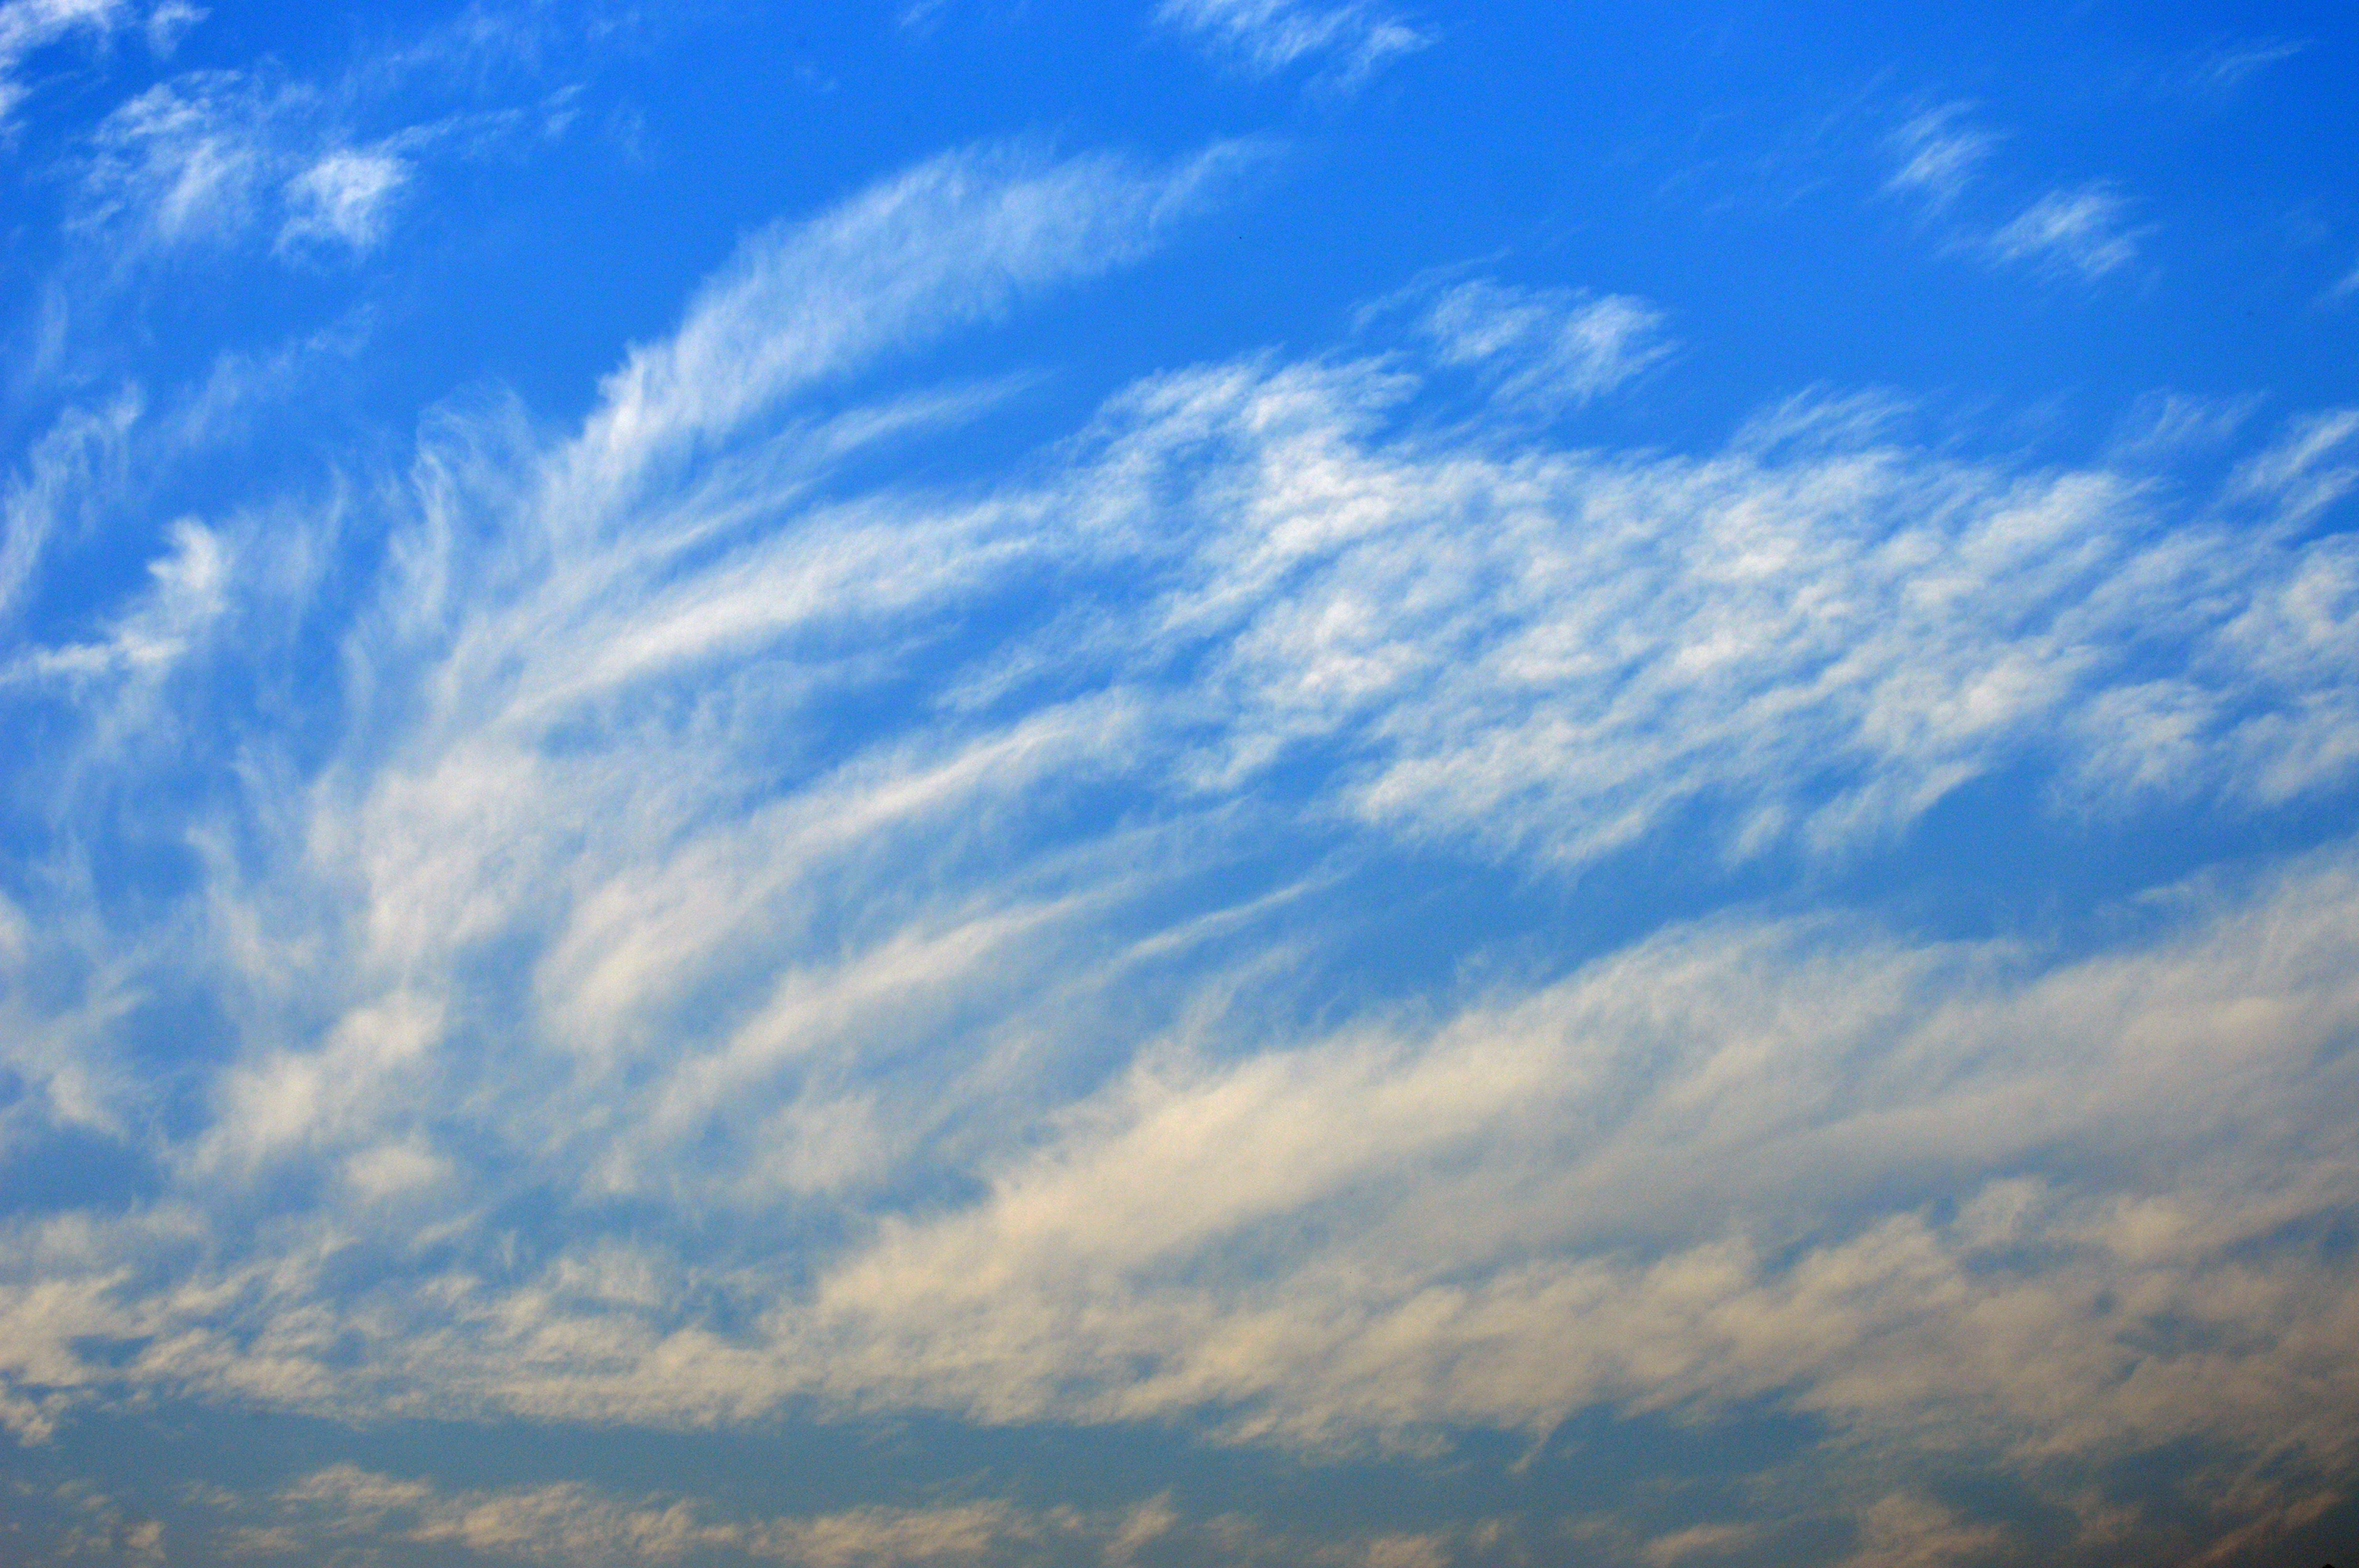 Free stock photo of blue sky, cloudy skies, cloudy sky, sky